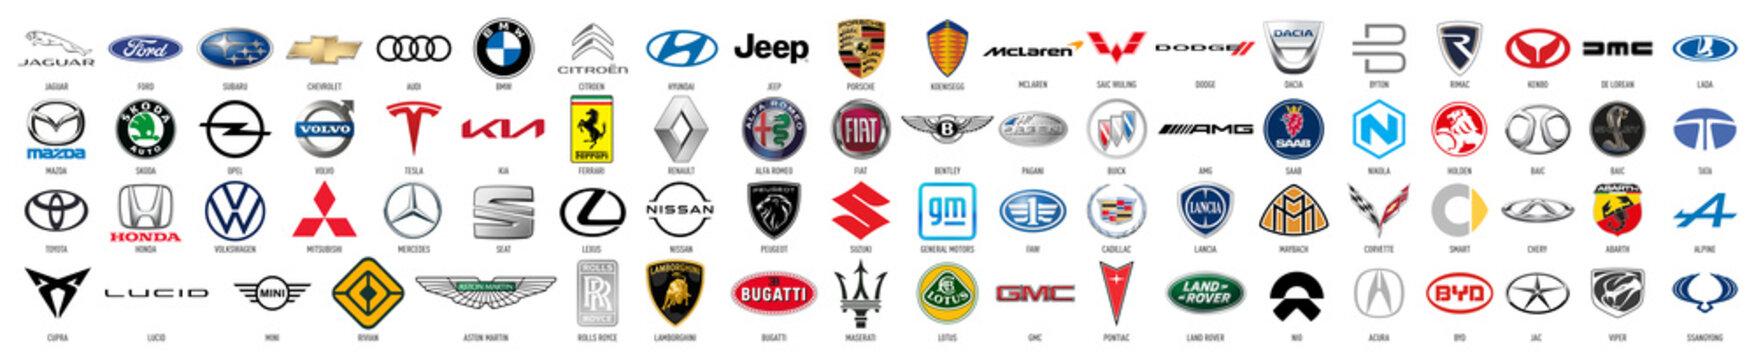 Car brands logos collection. VW, BMW, Audi, Mercedes, Lexus, Renault, Seat, Fiat, Citroen, Opel, Ferrari, Jaguar, Kia, Ford, Toyota, Honda and more, vector icons set